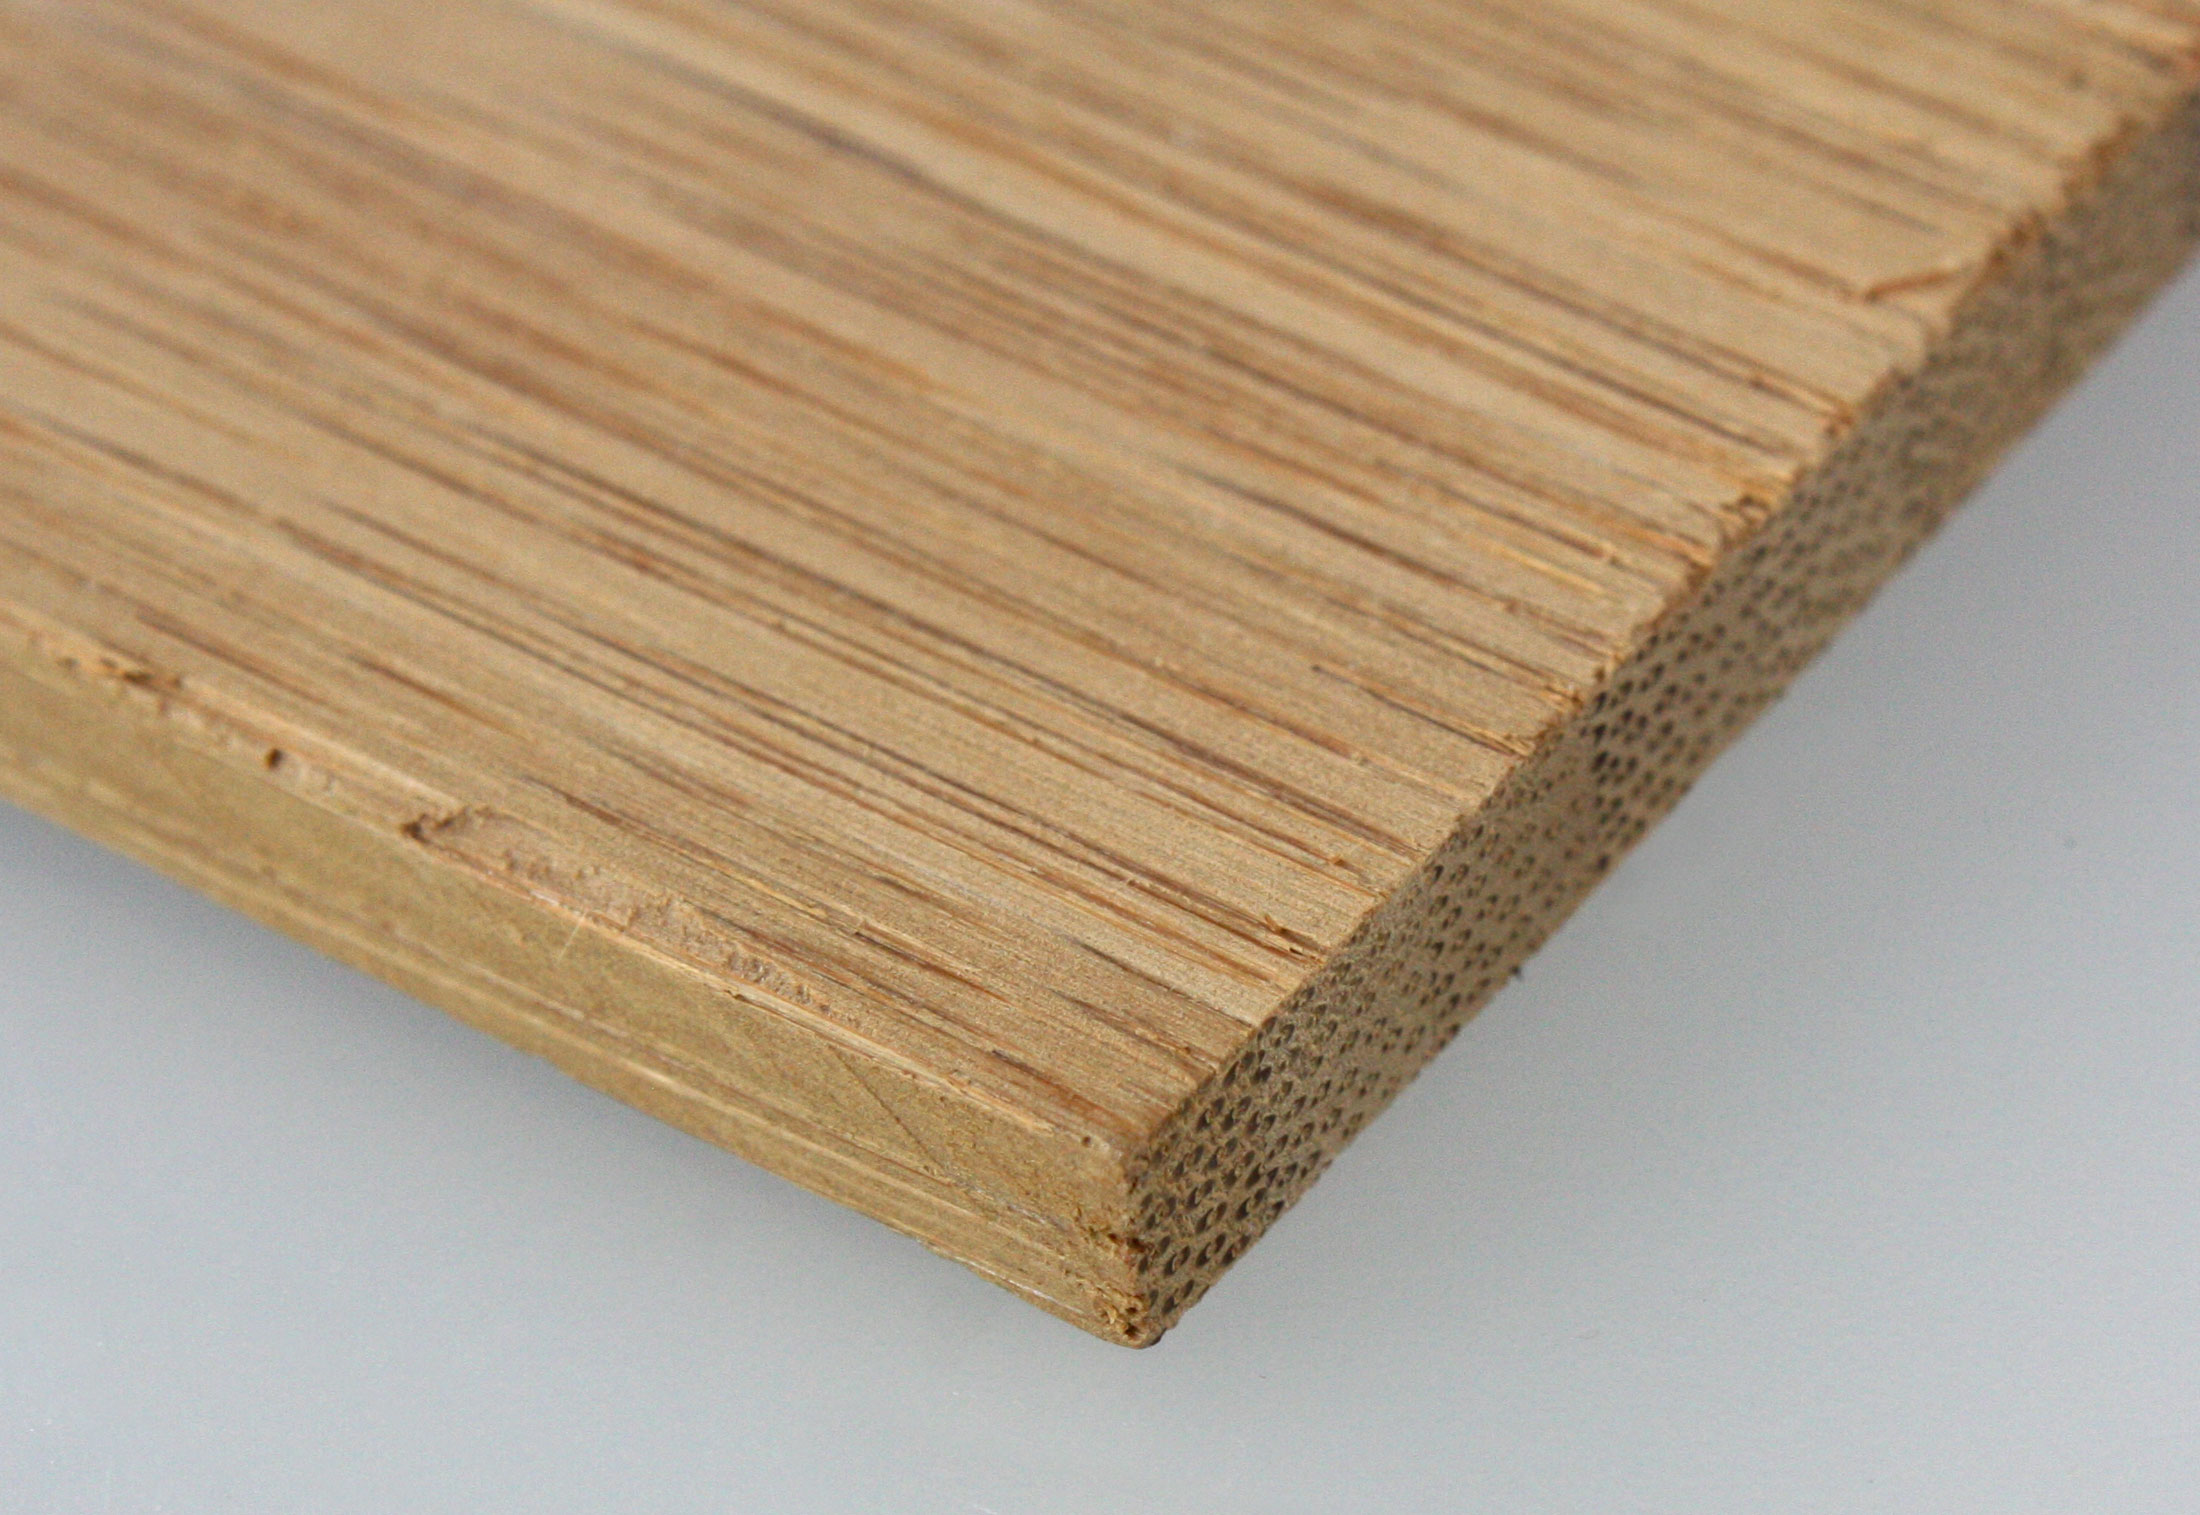 moso® starkfurnier bambusplatte von moso | stylepark